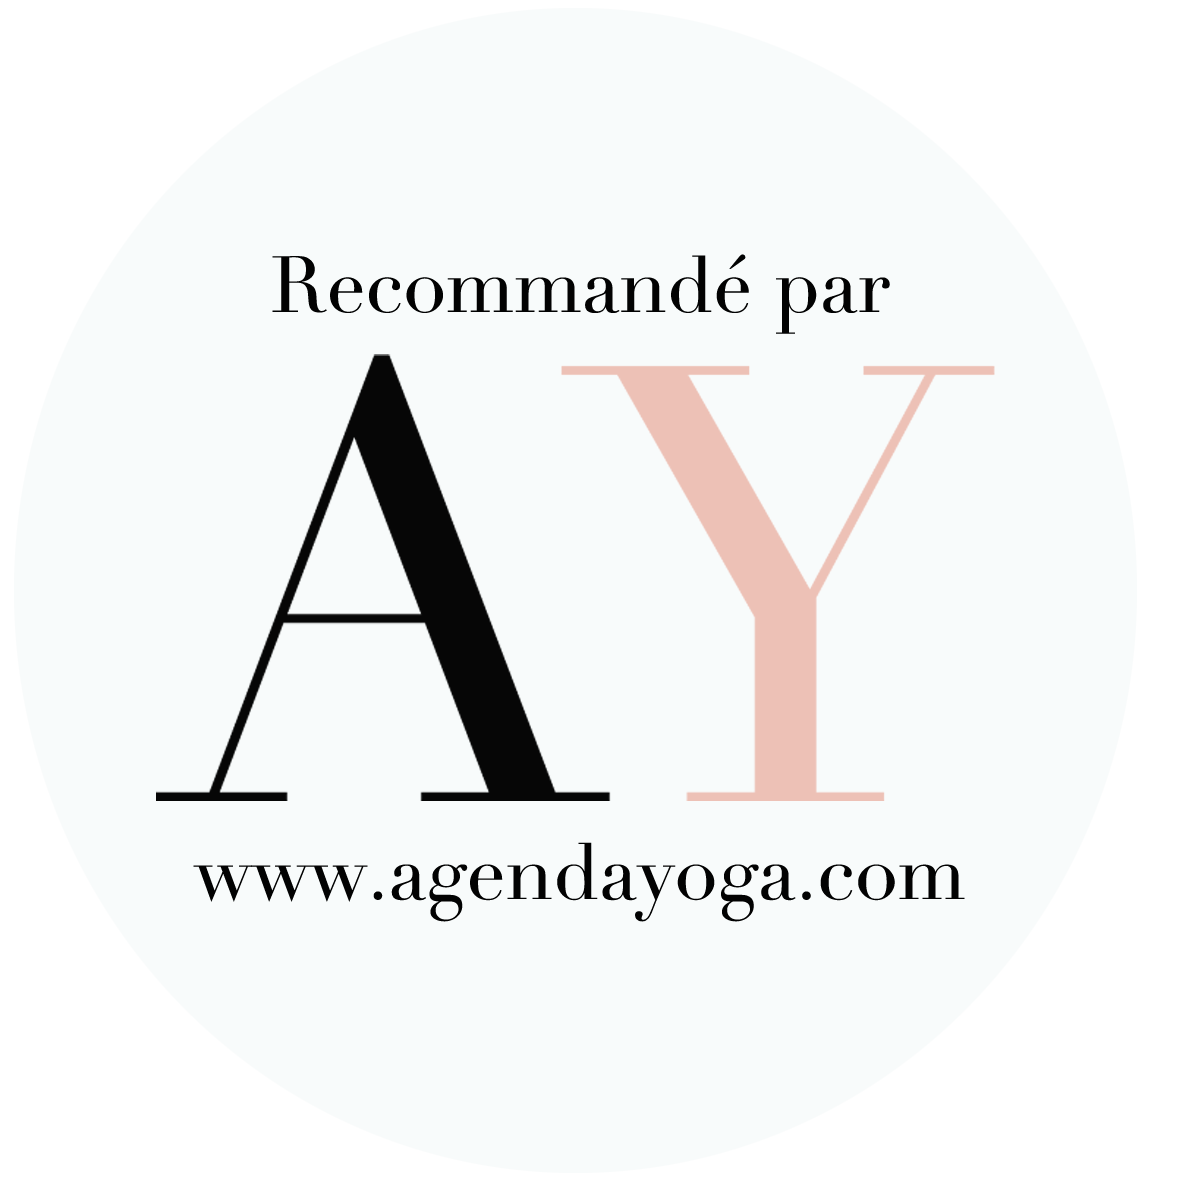 osteopathe-biarritz-agenda-yoga.png